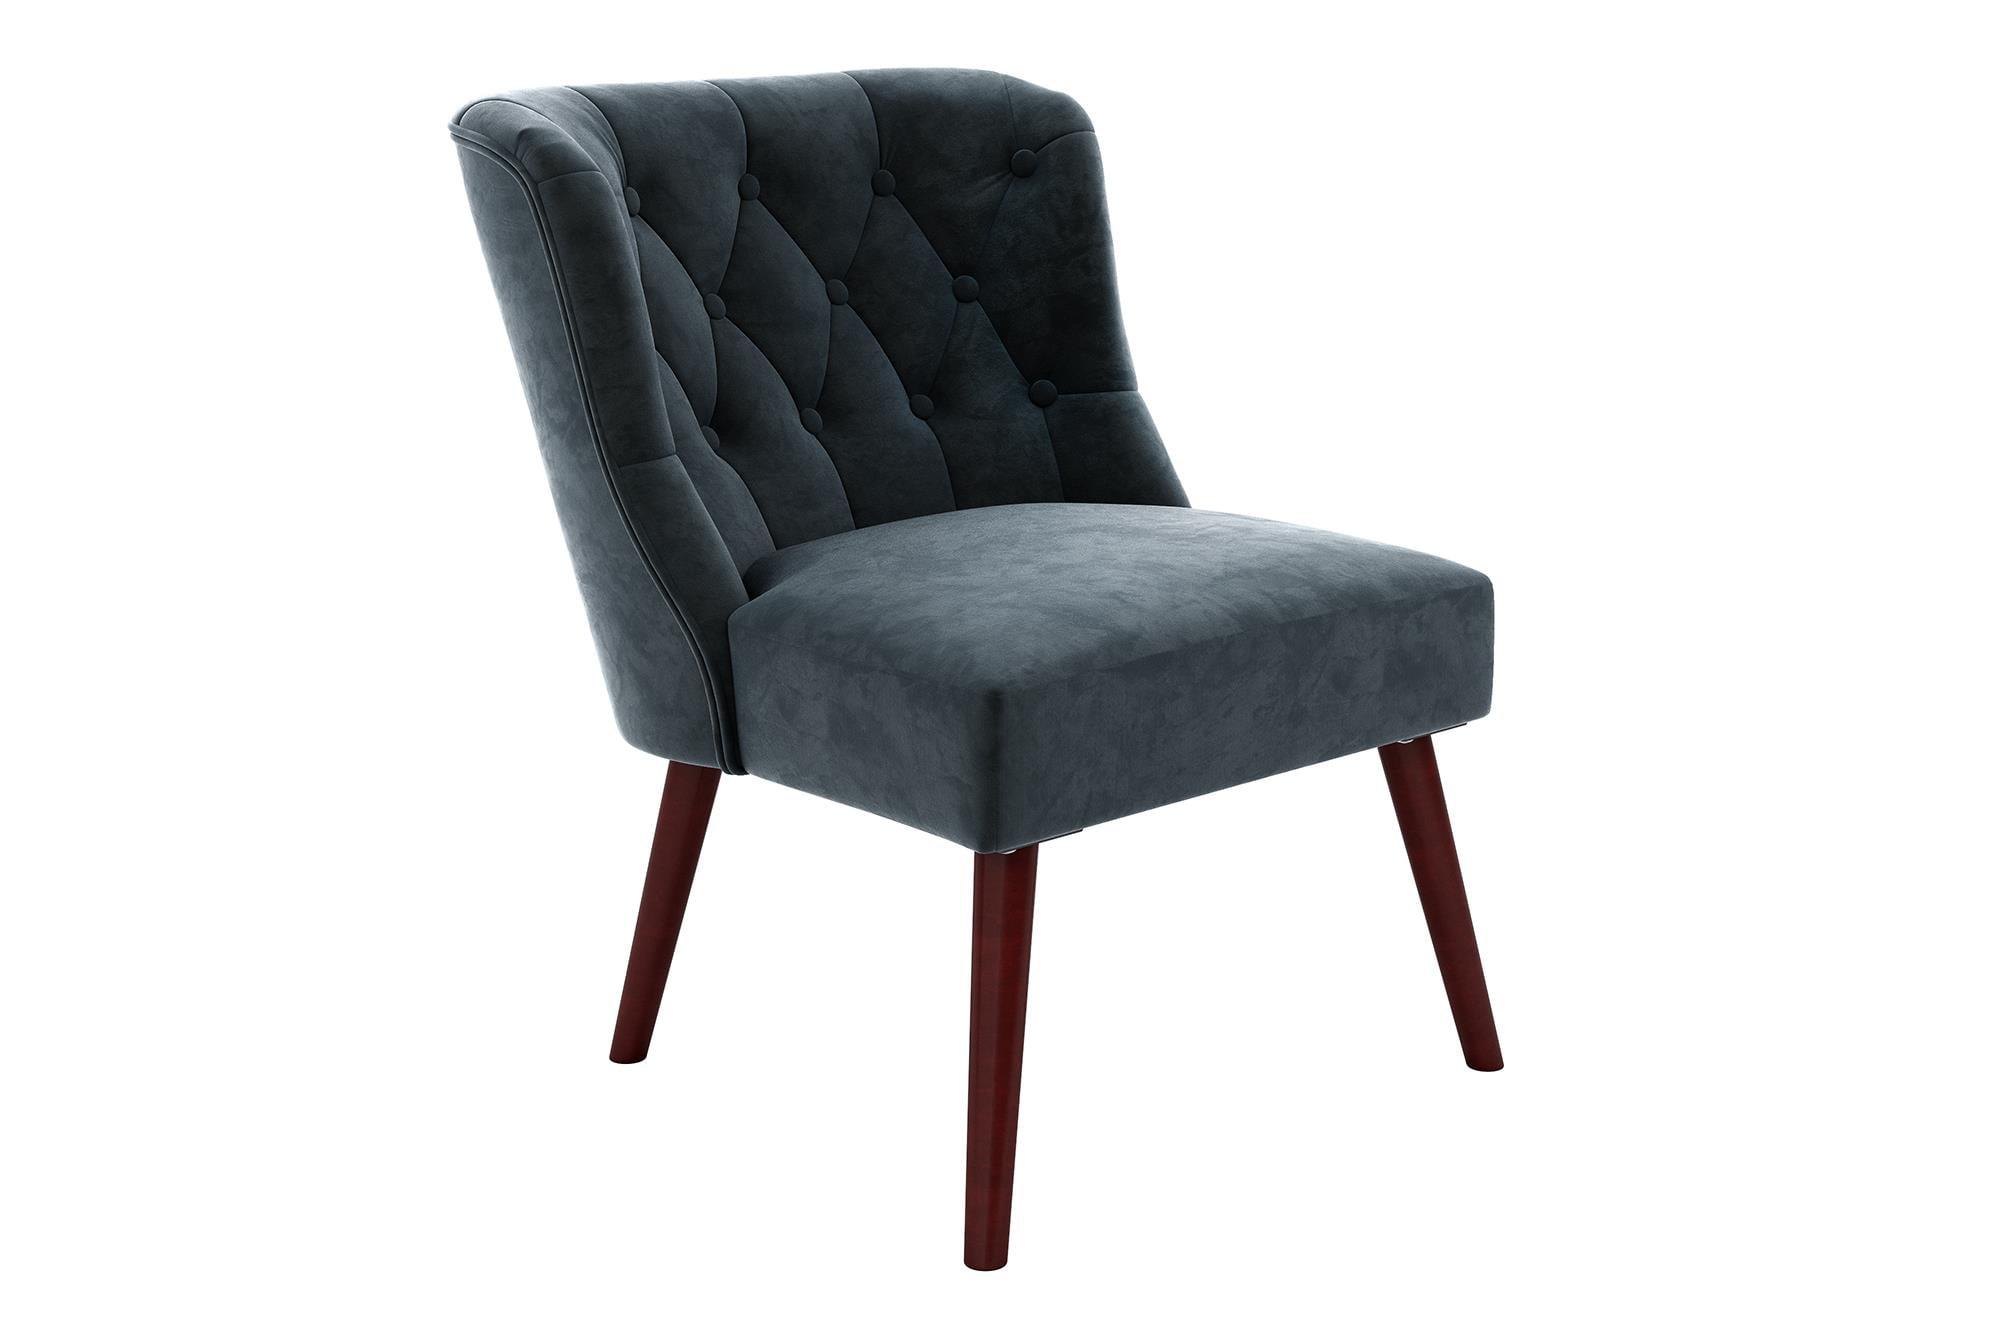 Peachy Novogratz Vintage Tufted Accent Chair Multiple Colors Creativecarmelina Interior Chair Design Creativecarmelinacom